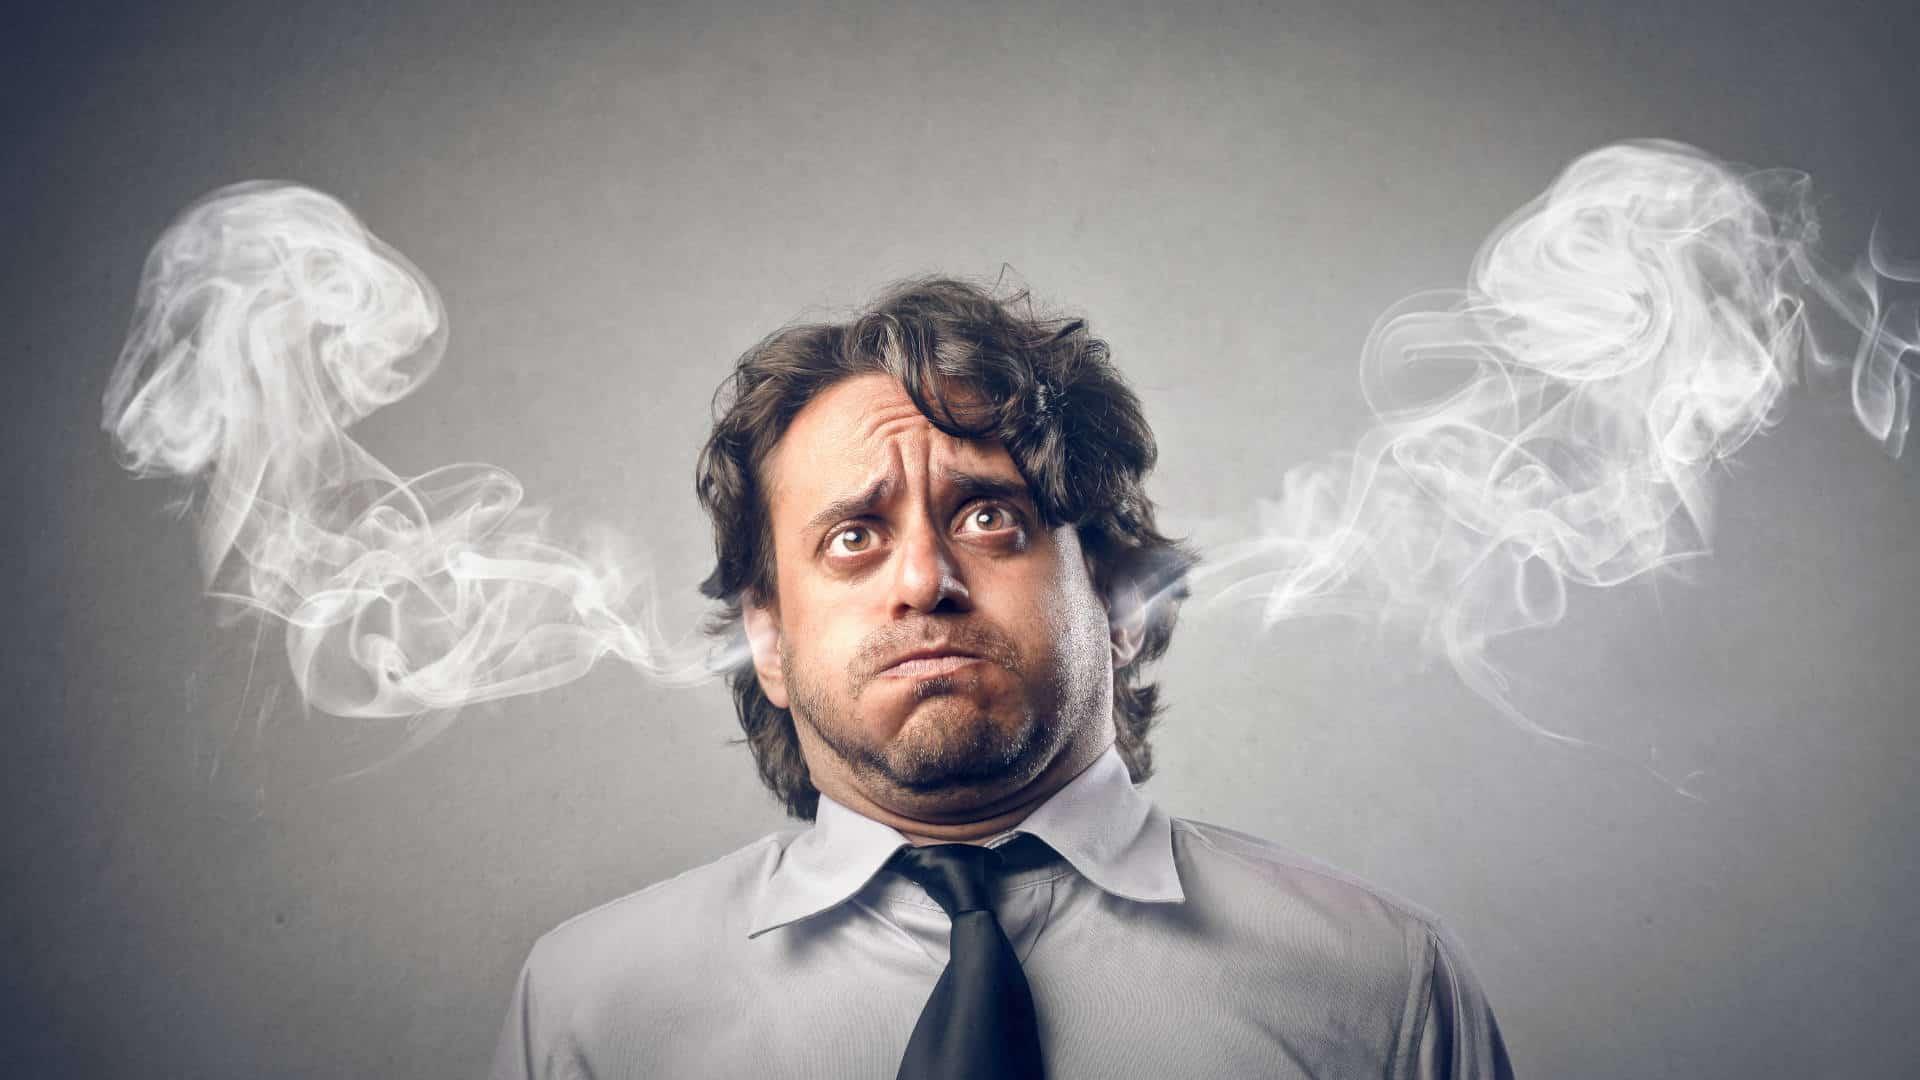 Mensch im Stress